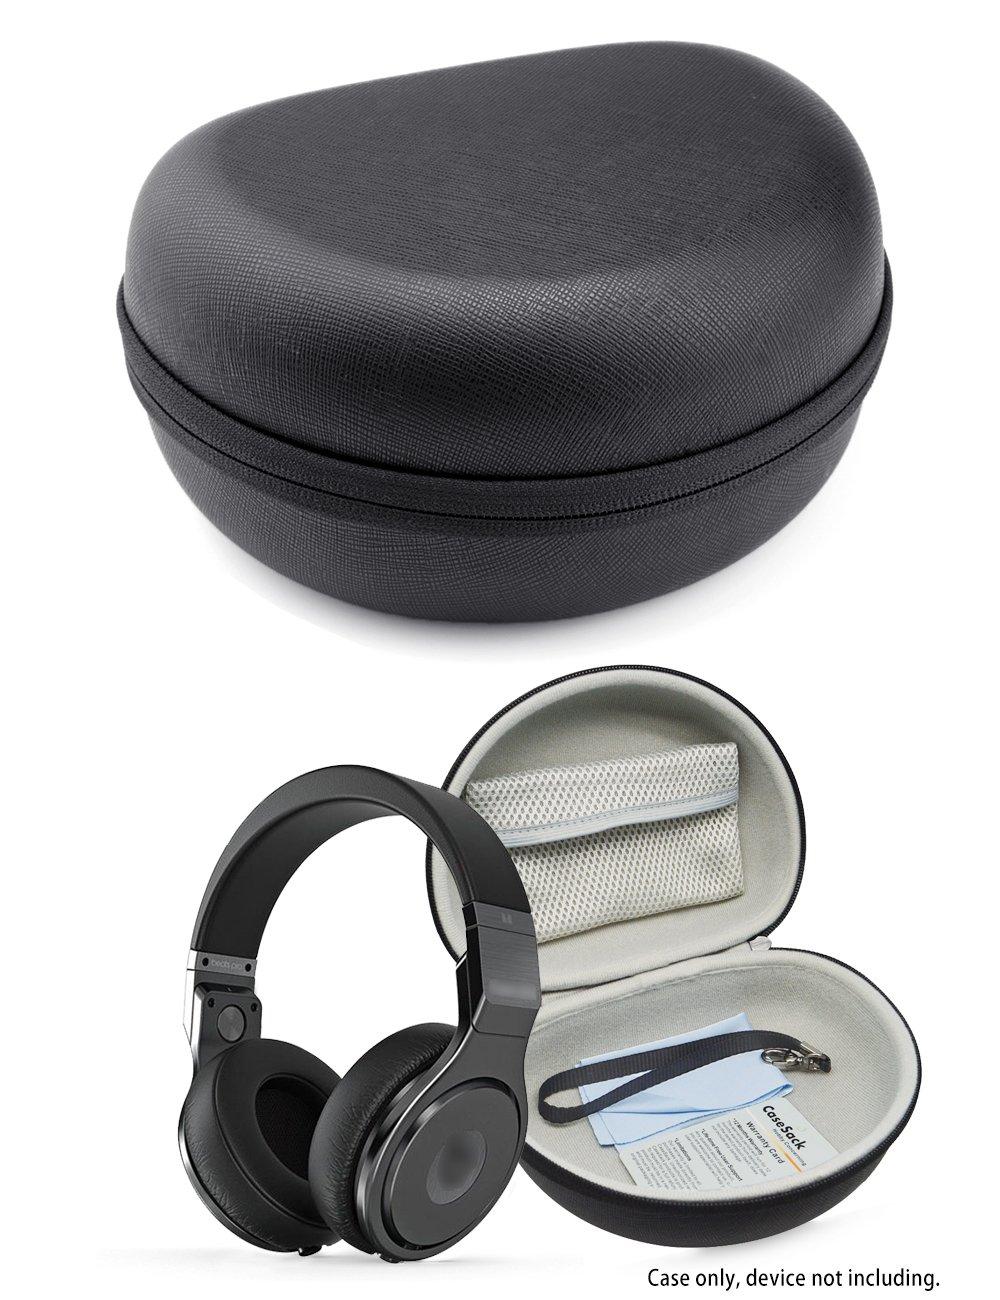 Case Rigido Para Auriculares Jbl / Sony / Dr Beats / Senheis